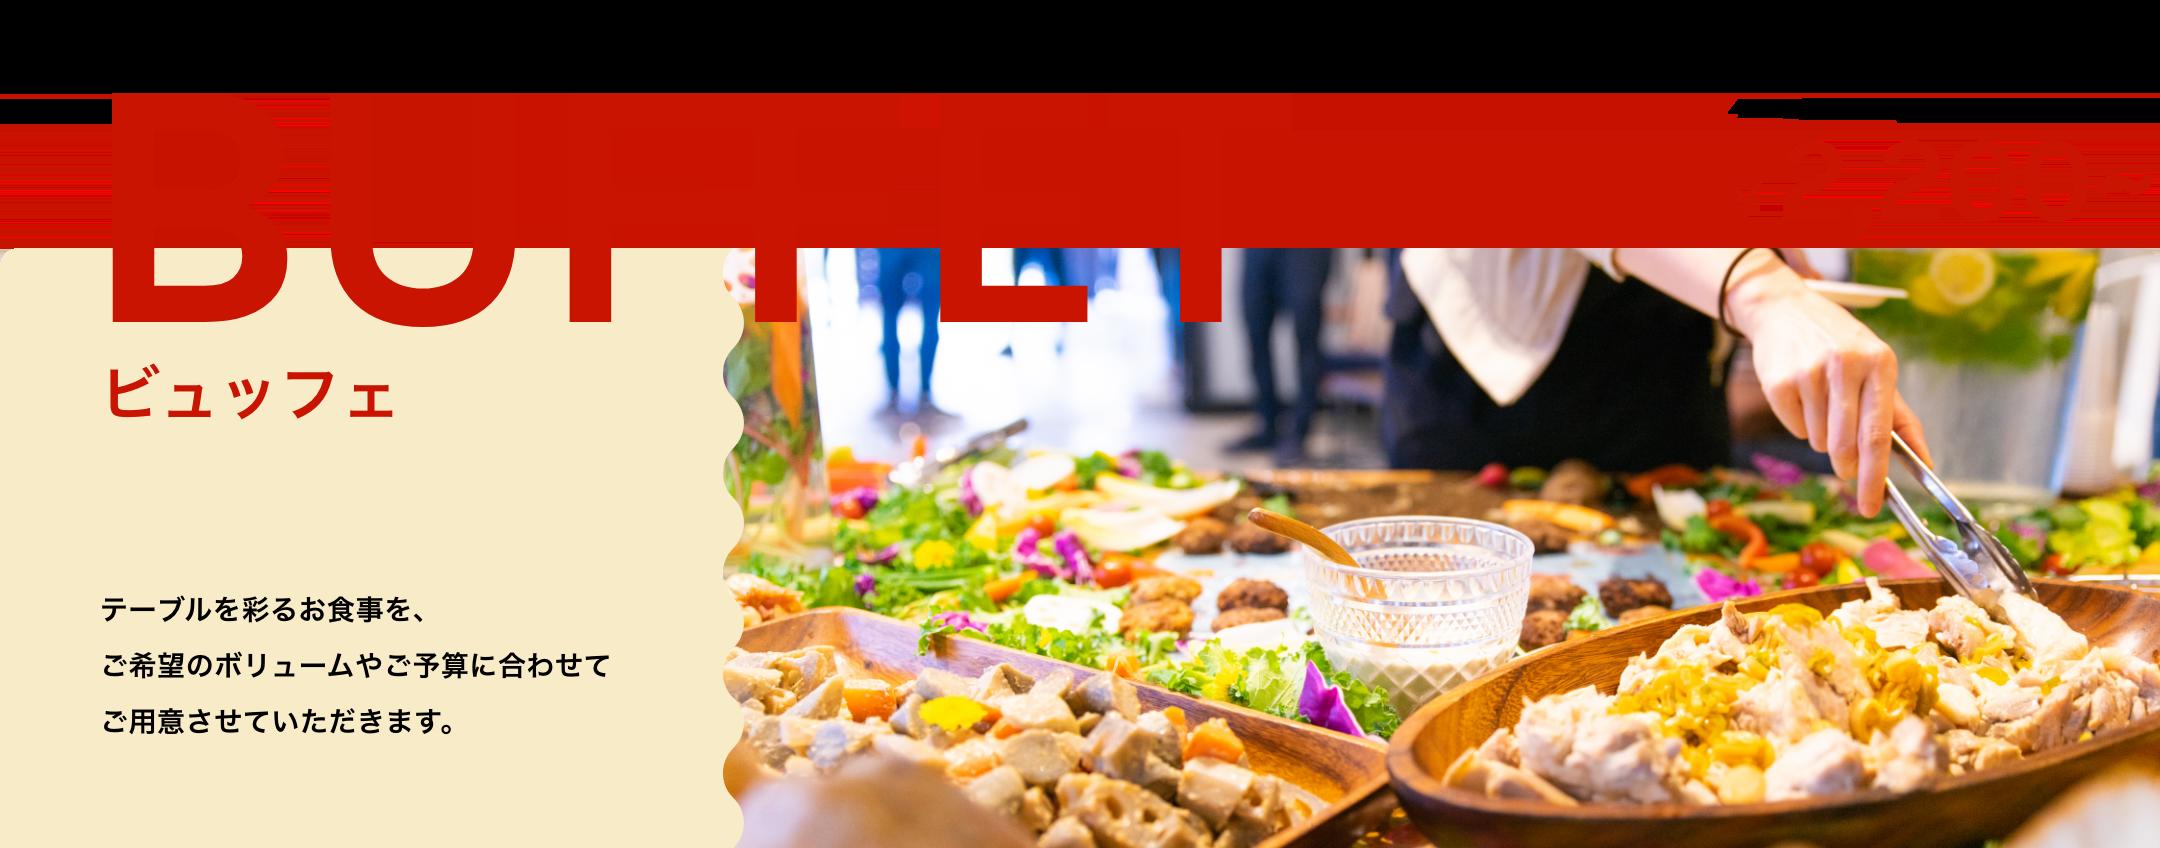 Buffet|GOBLIN.のケータリング